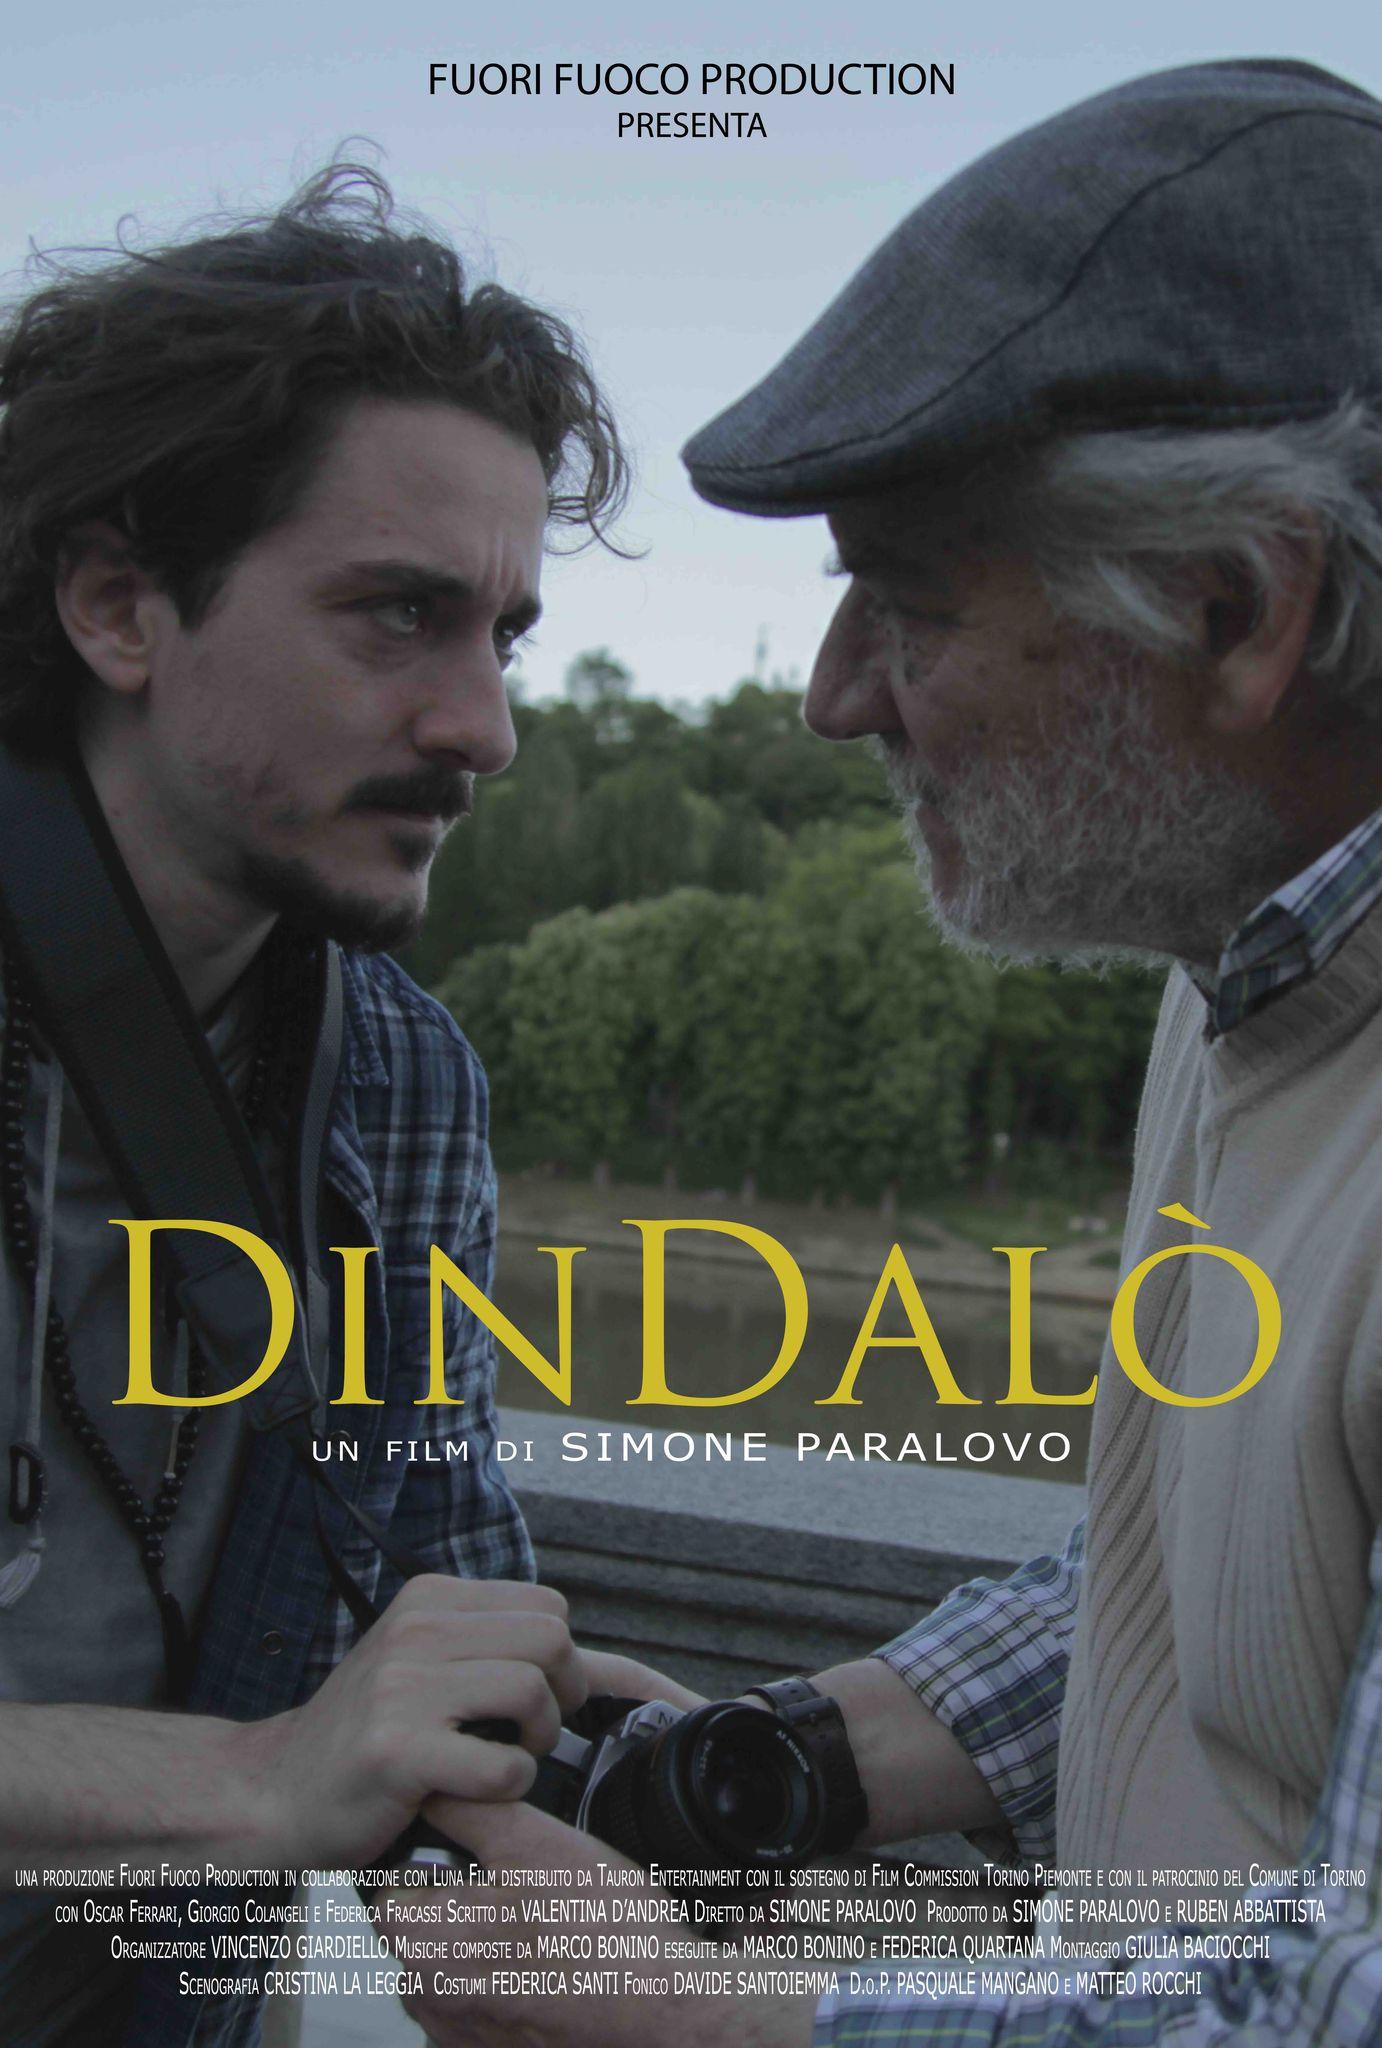 DinDalo'